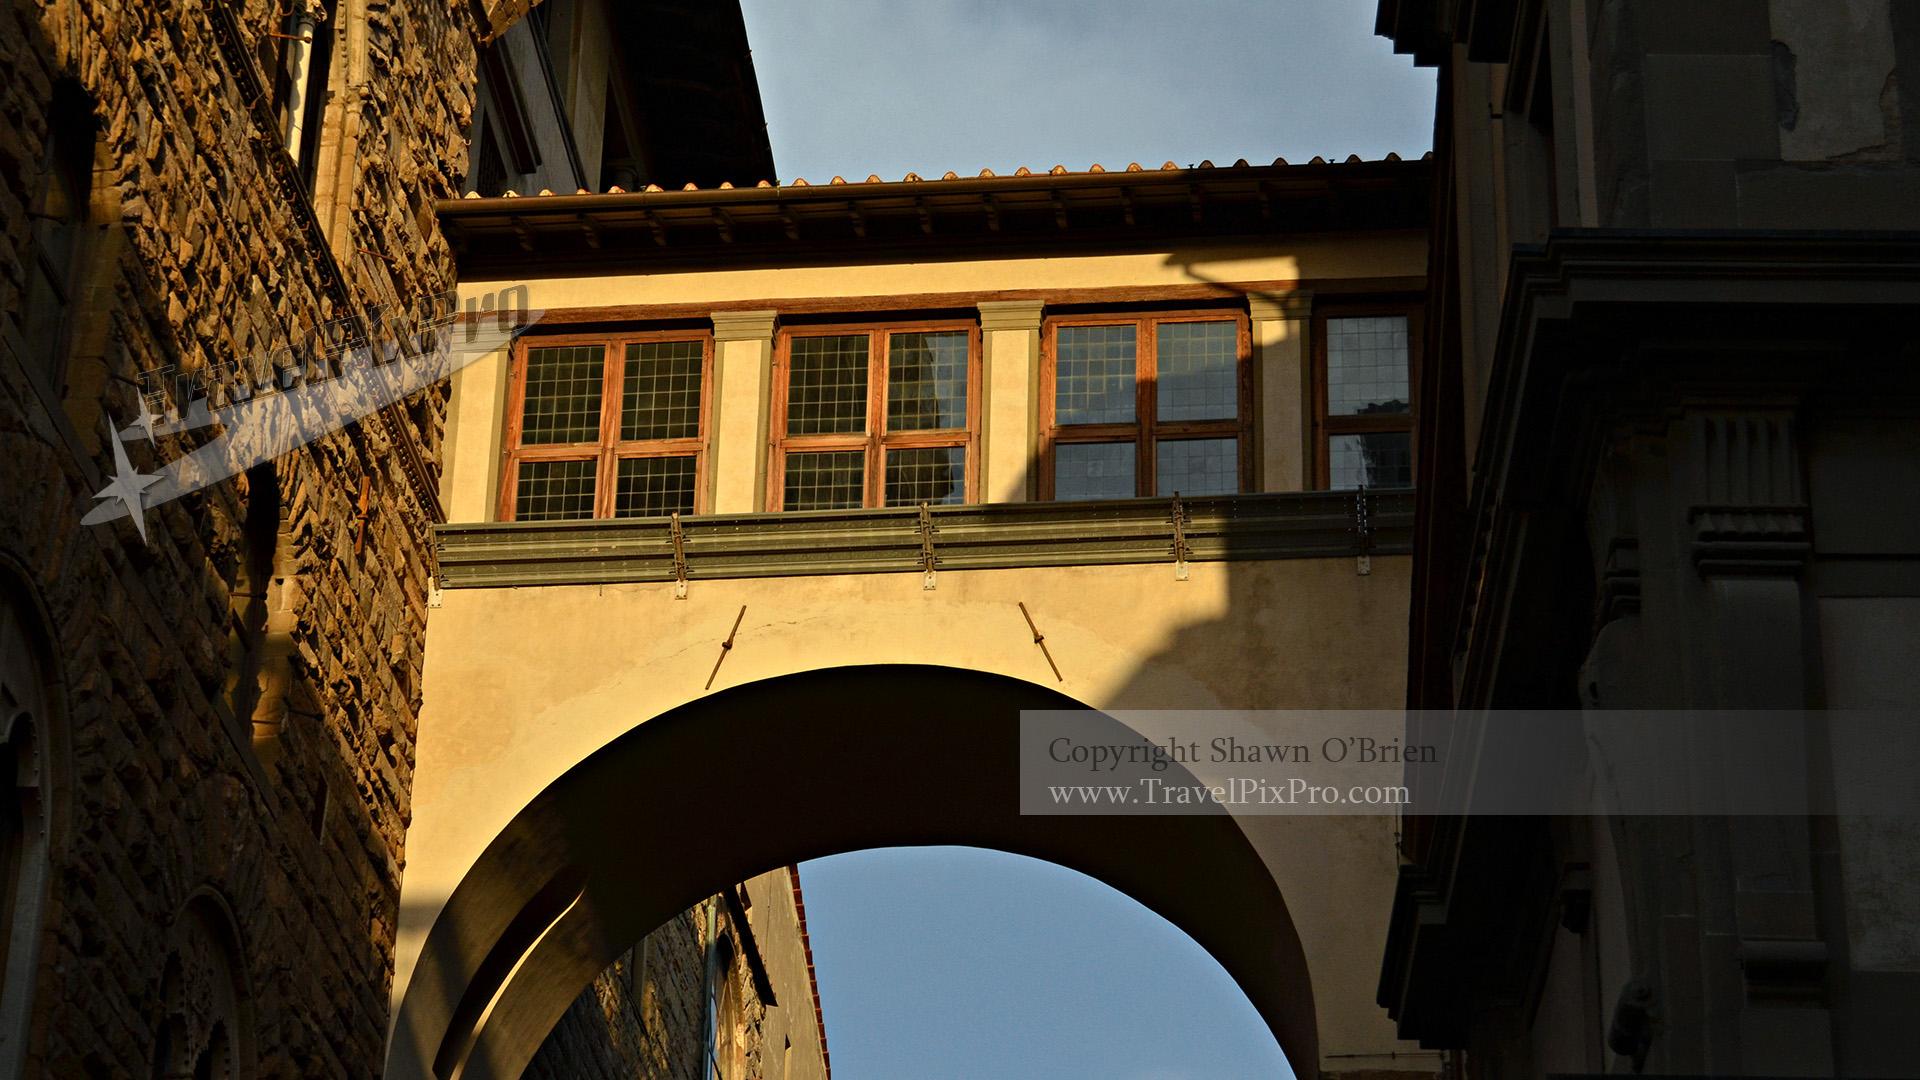 Palazzo Vecchio Elevated Walkway